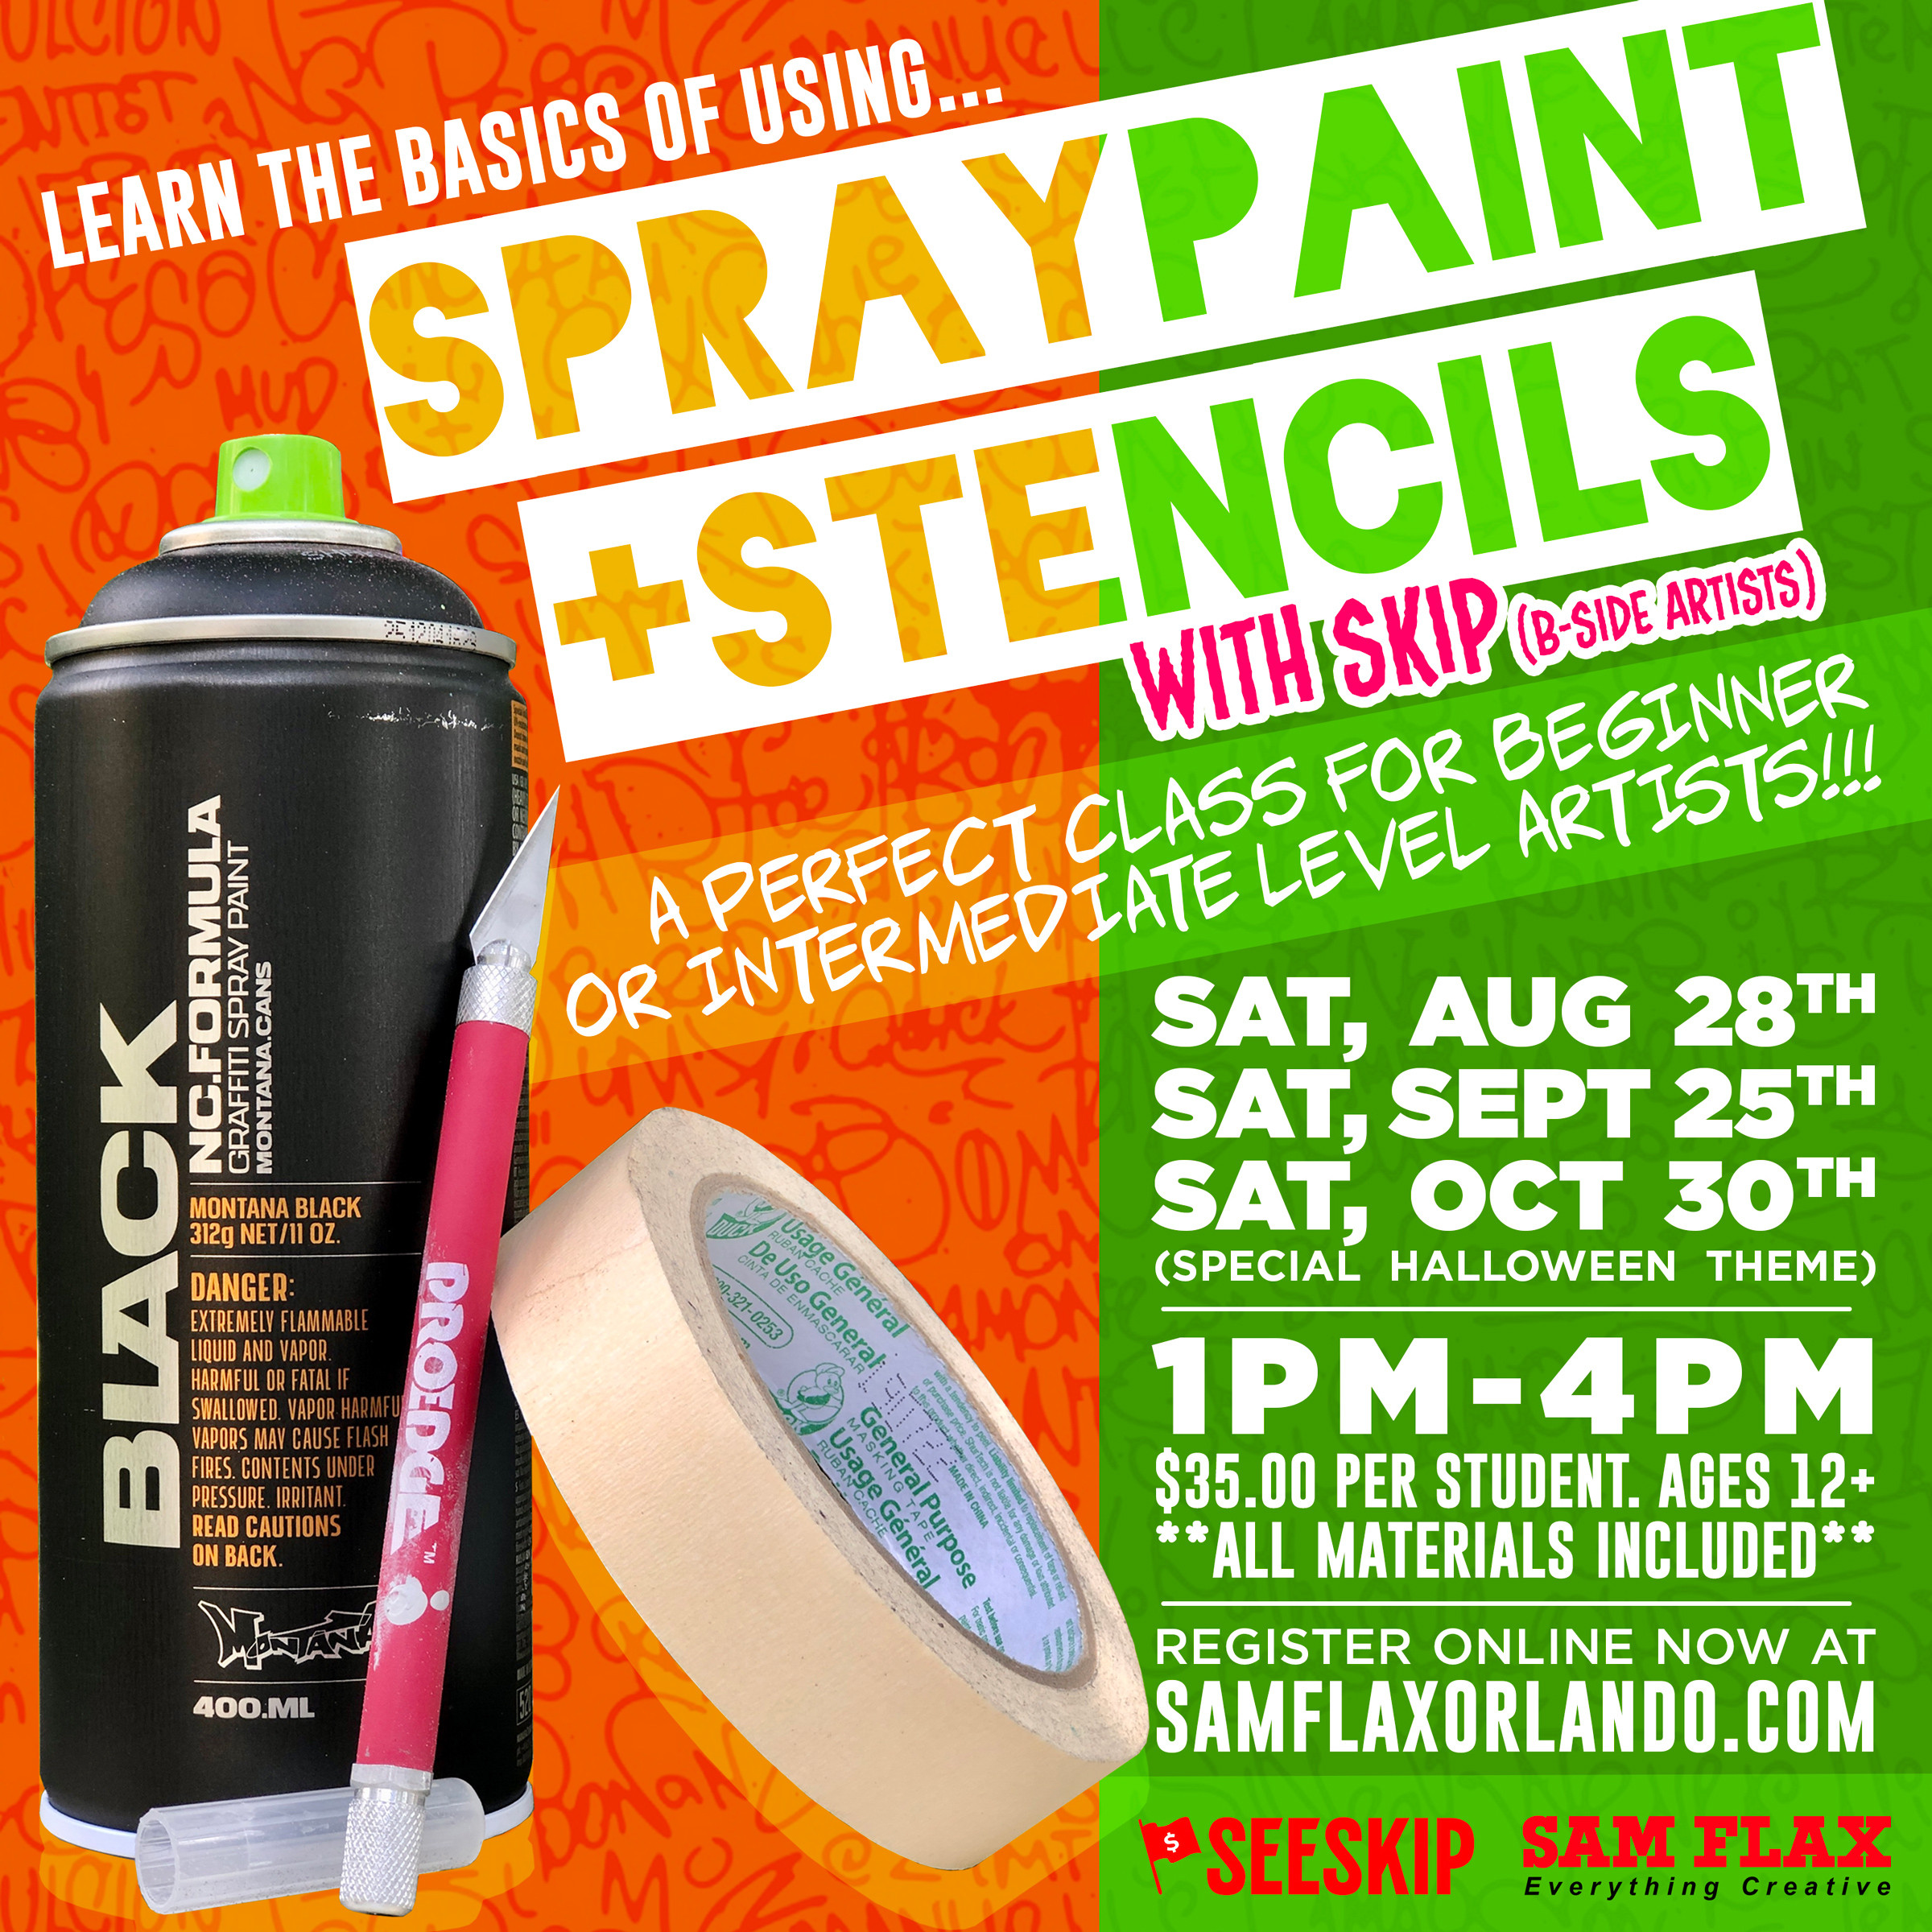 Spray Paint & Stencils Class with SKIP